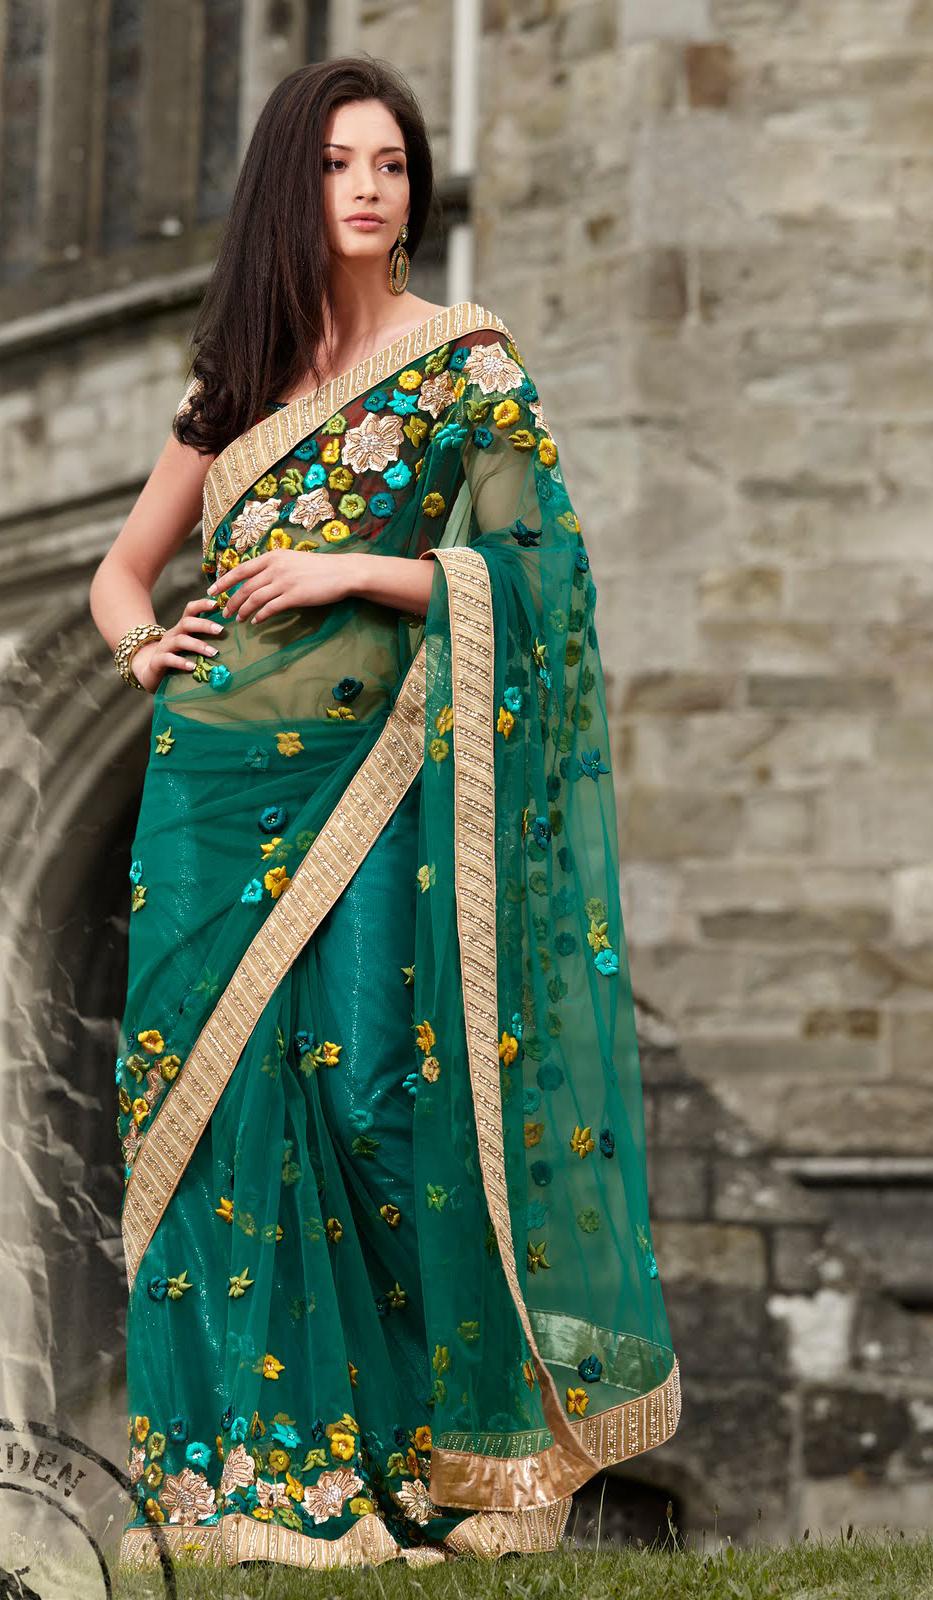 Fashion Magazine Sea Green Saree Collection